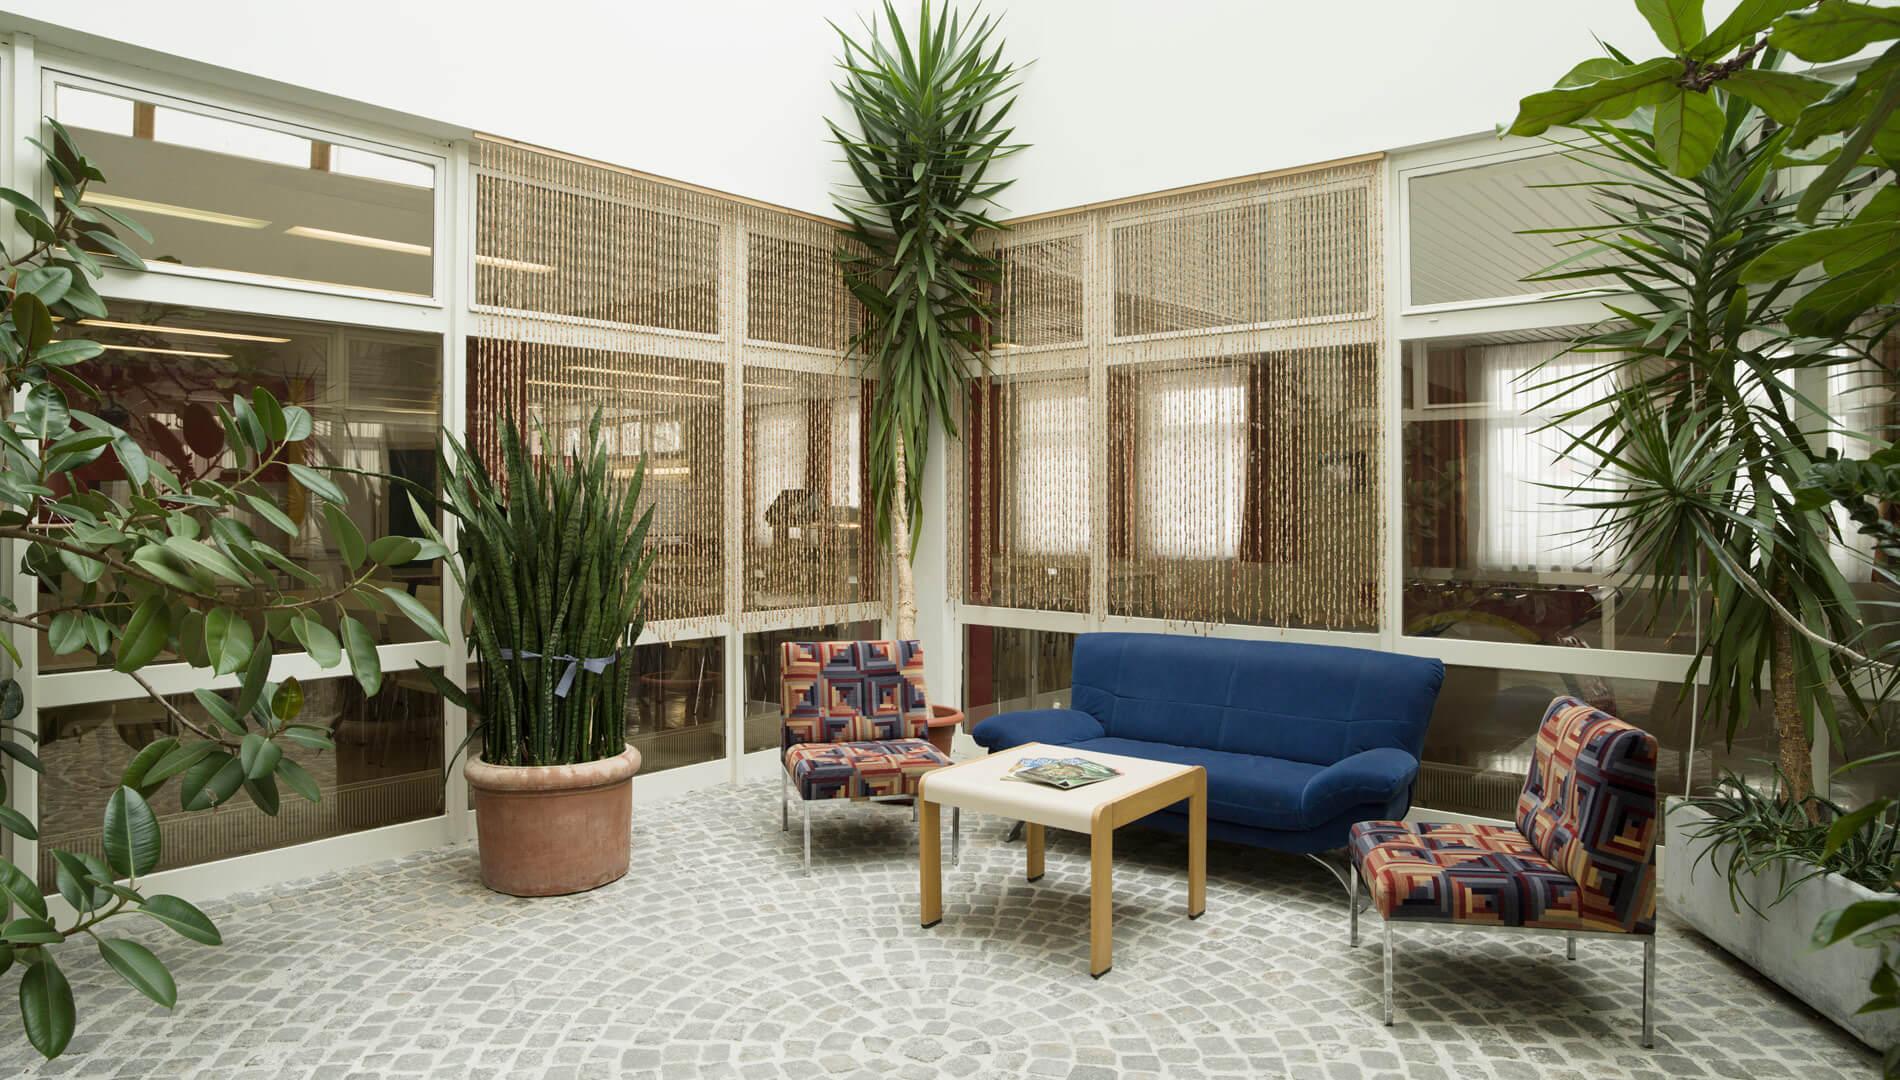 djw-heimbauverein-foto-lounge